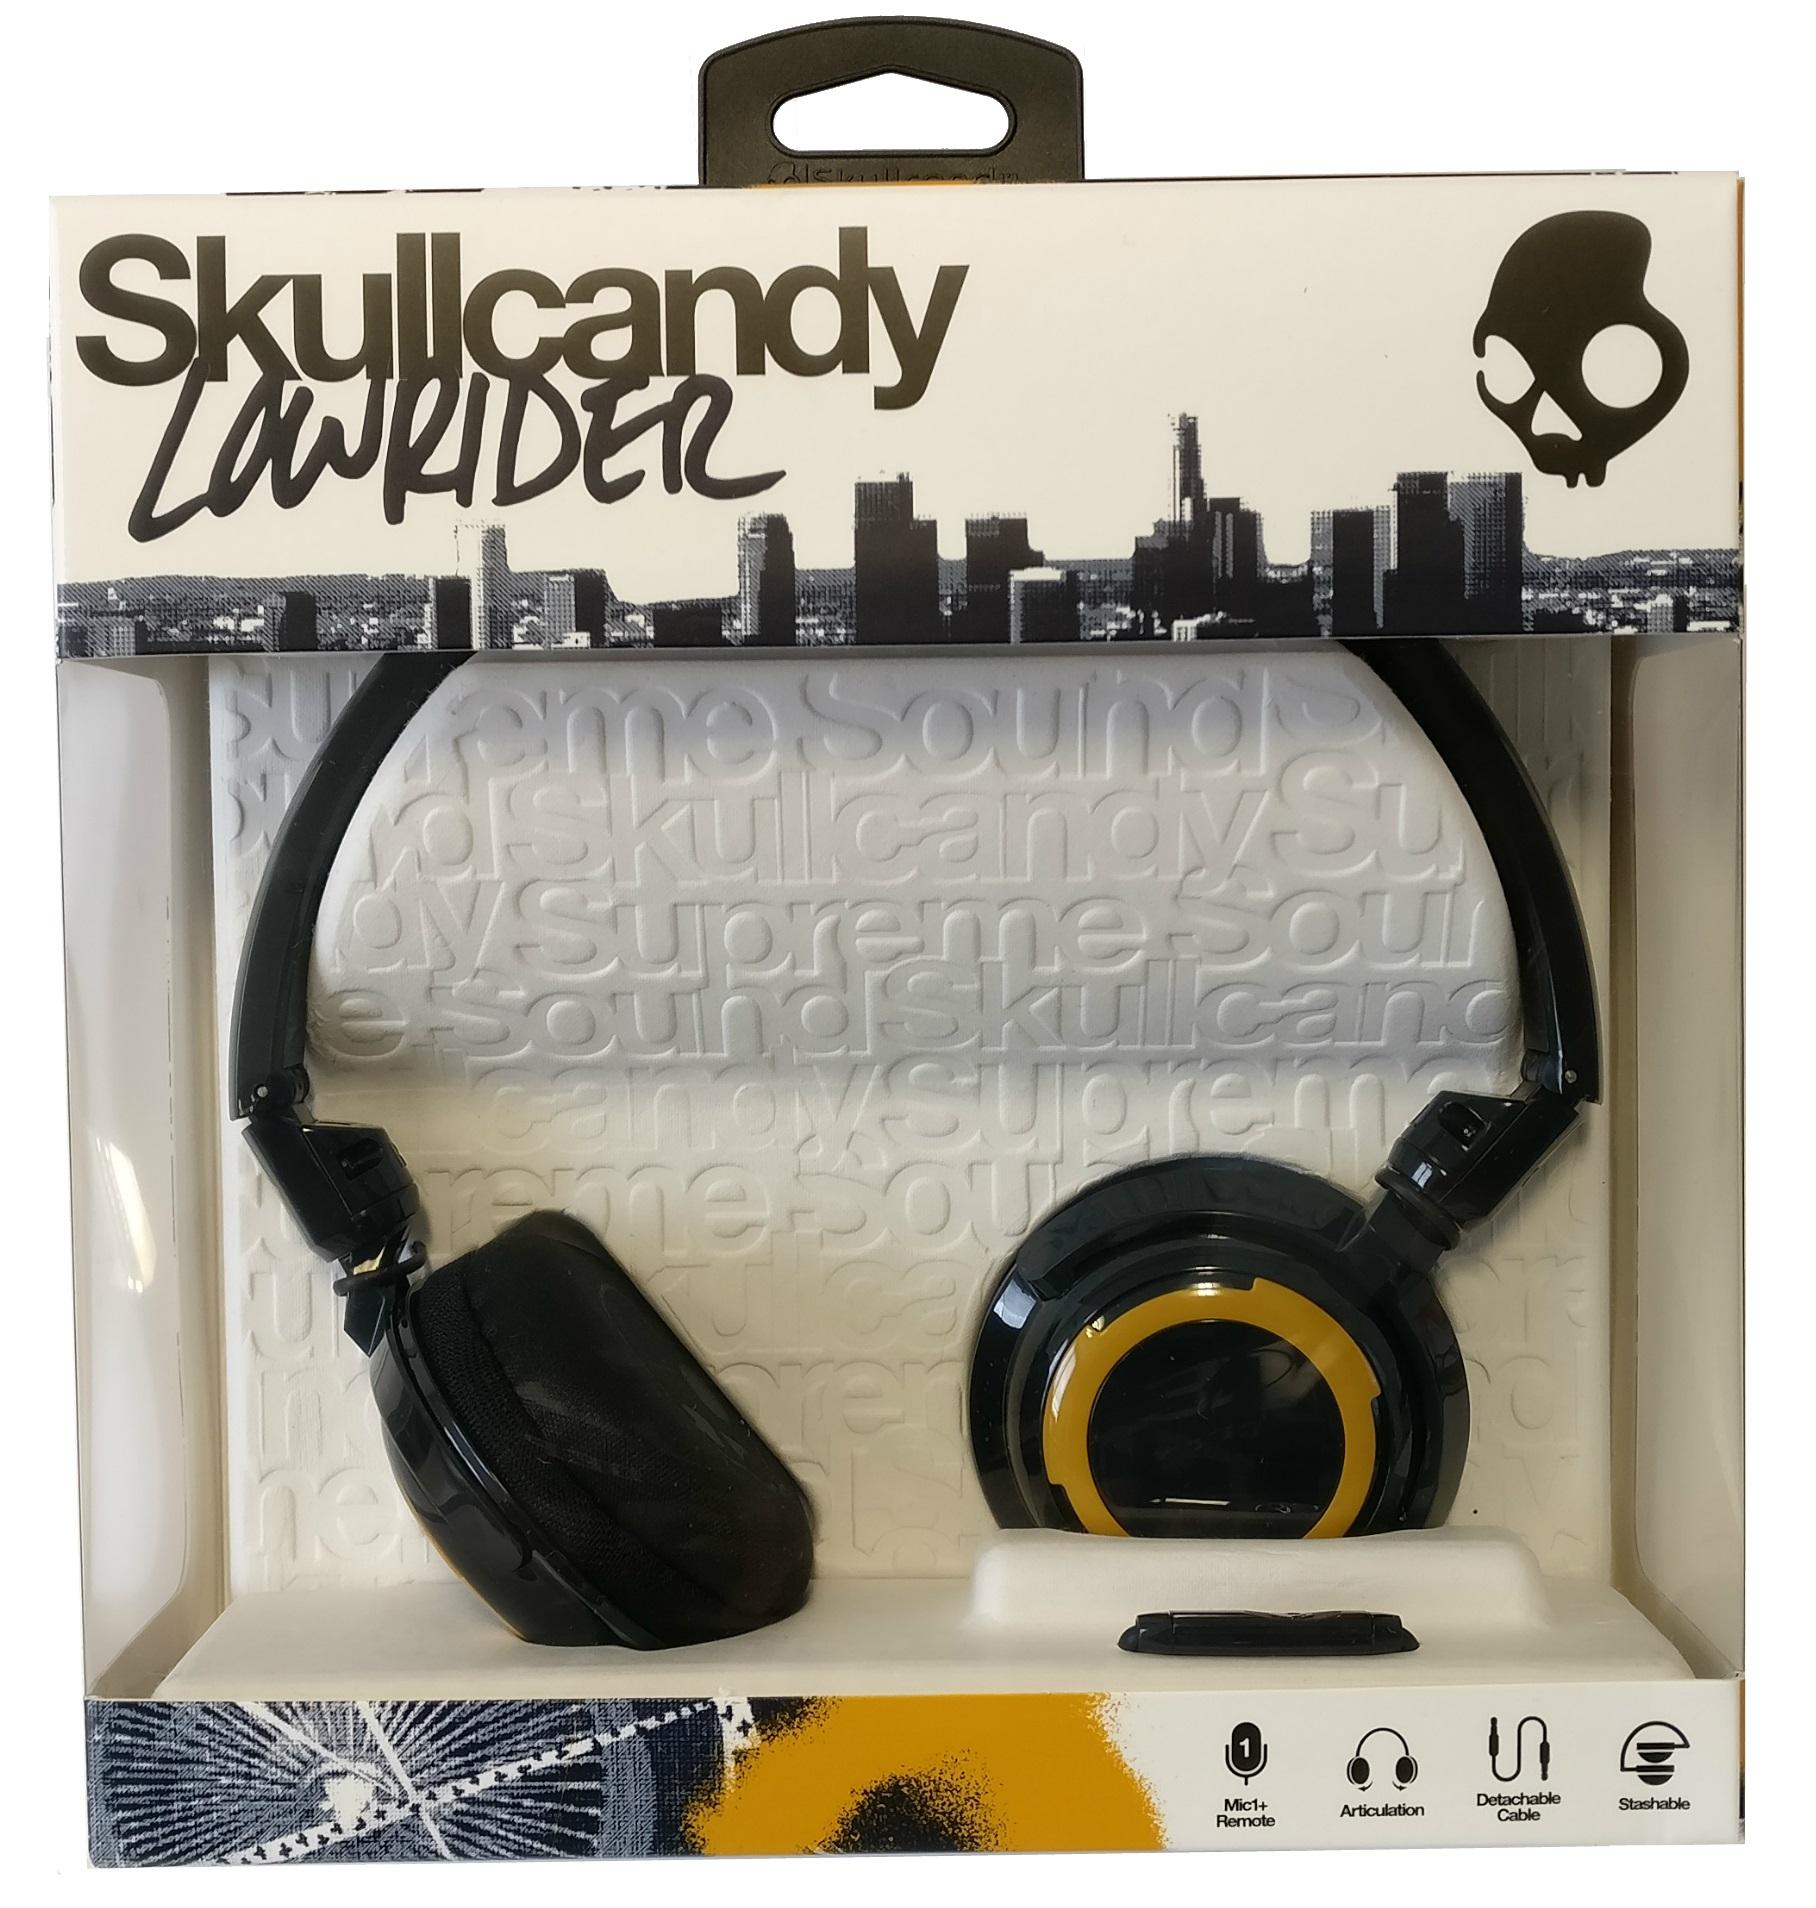 Skullcandy Headphones Wired | Skullcandy Navy Gold Lowrider Wired Headphones With Microphone